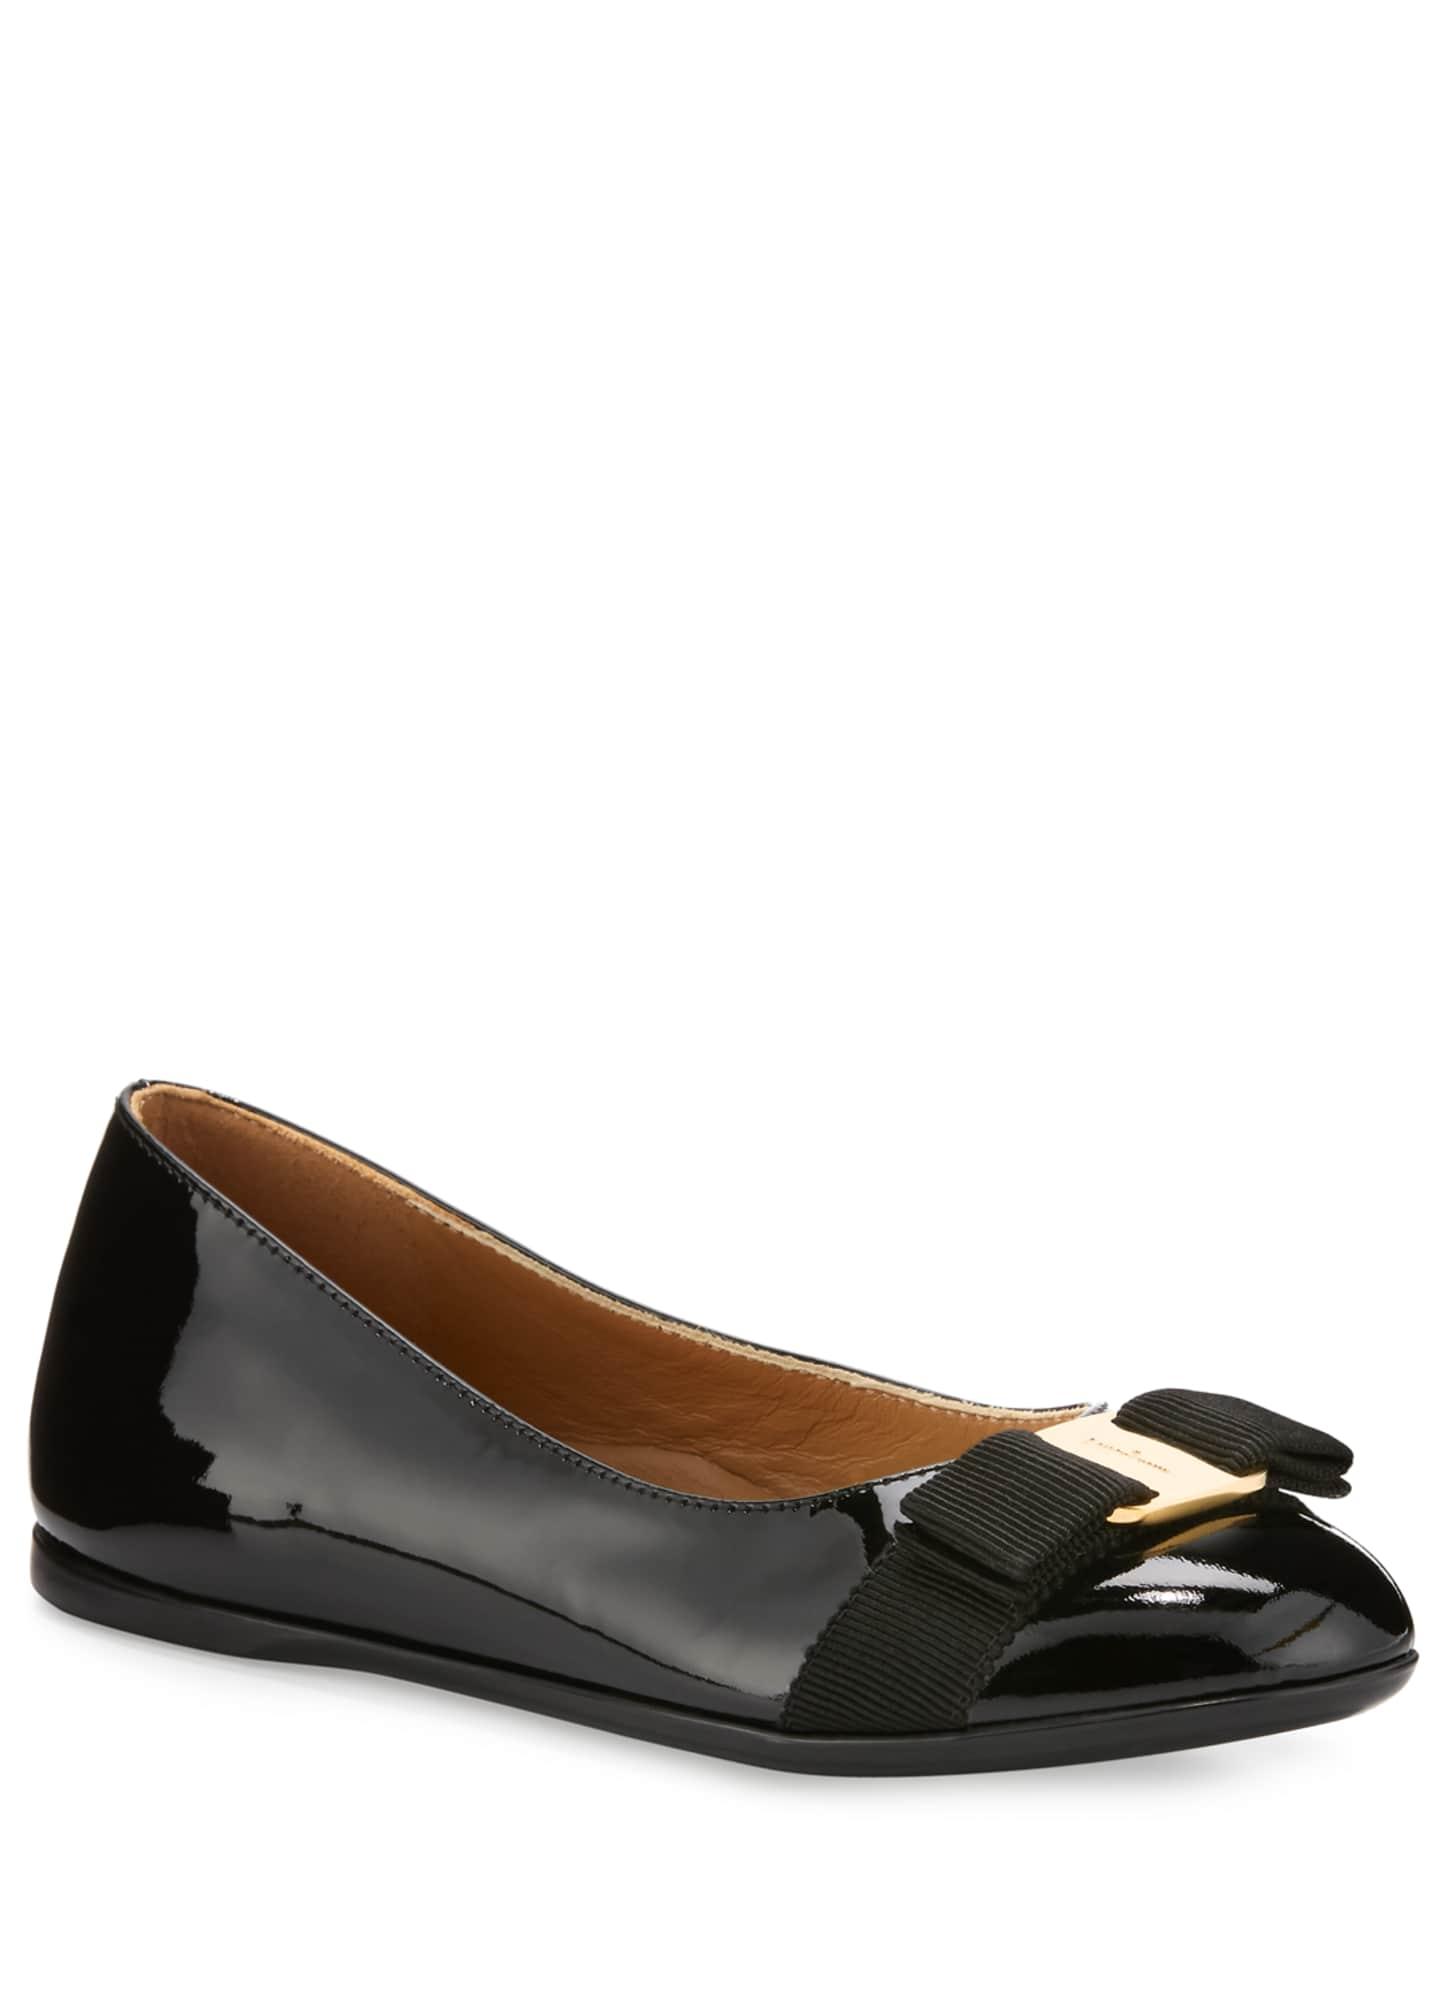 Salvatore Ferragamo Varina Mini Patent Leather Ballet Flats,